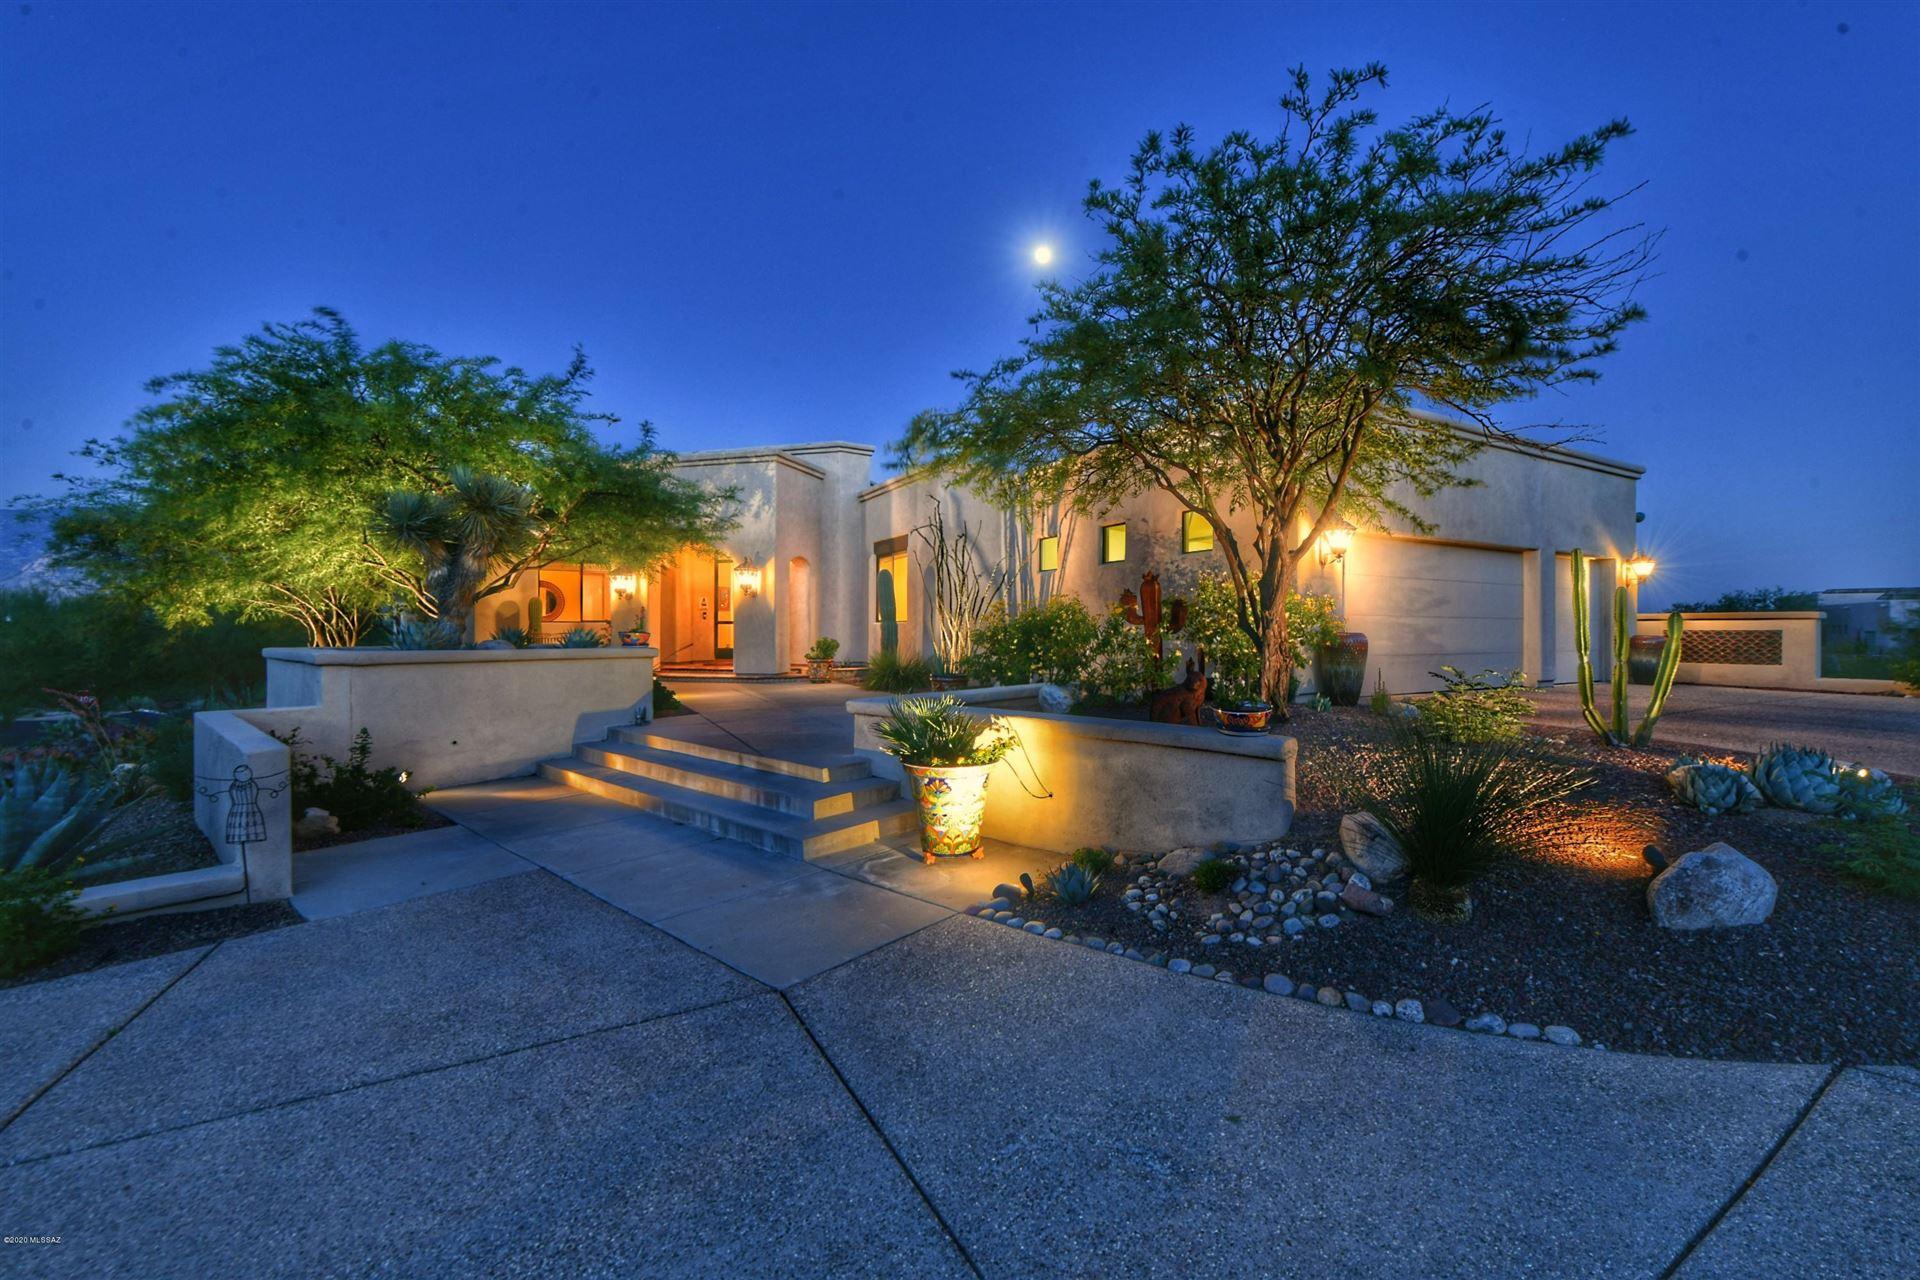 975 W Broken Stone Place, Oro Valley, AZ 85737 - MLS#: 22014169